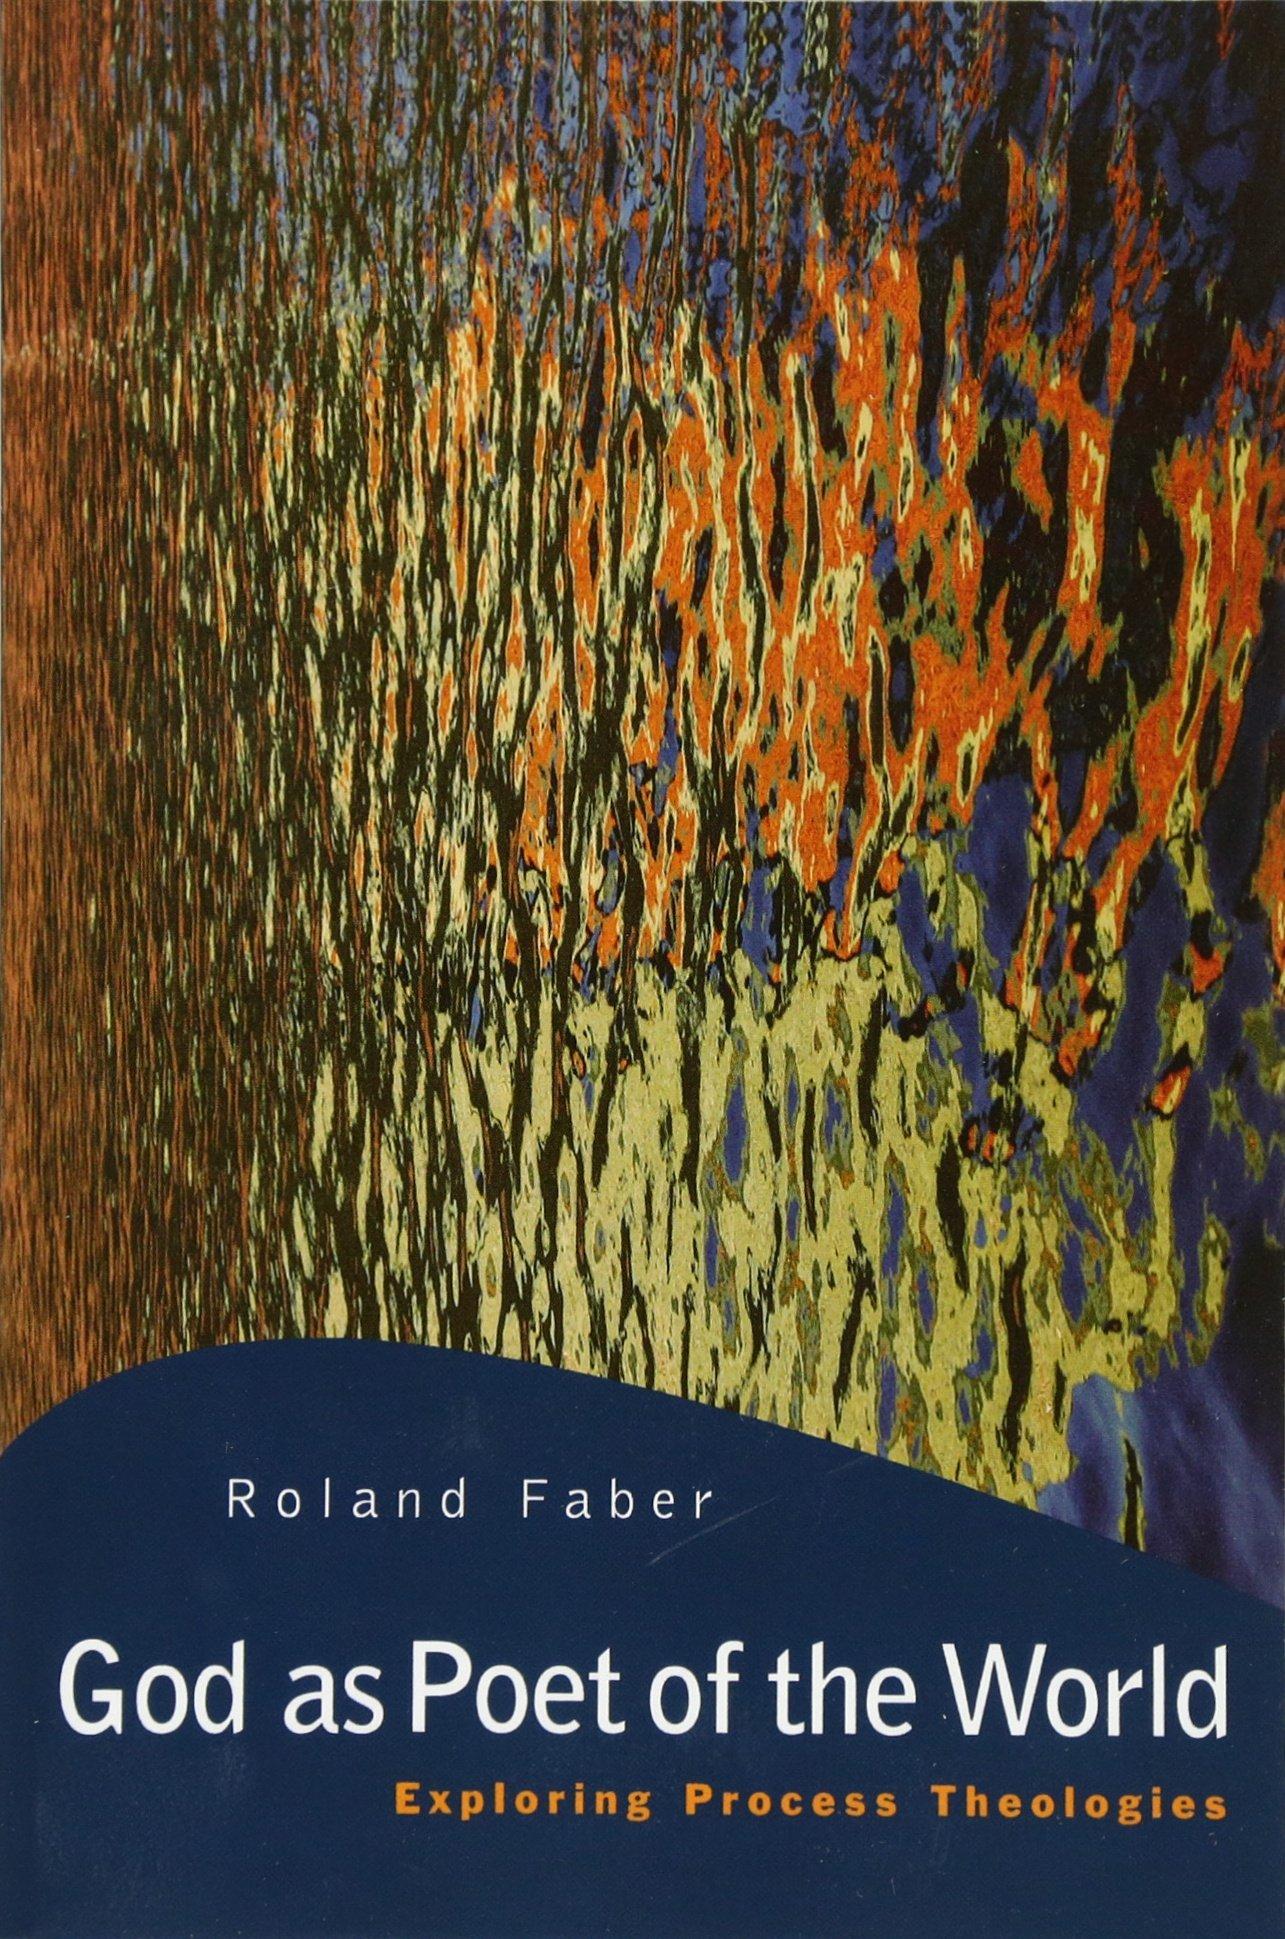 God as Poet of the World: Exploring Process Theologies PDF